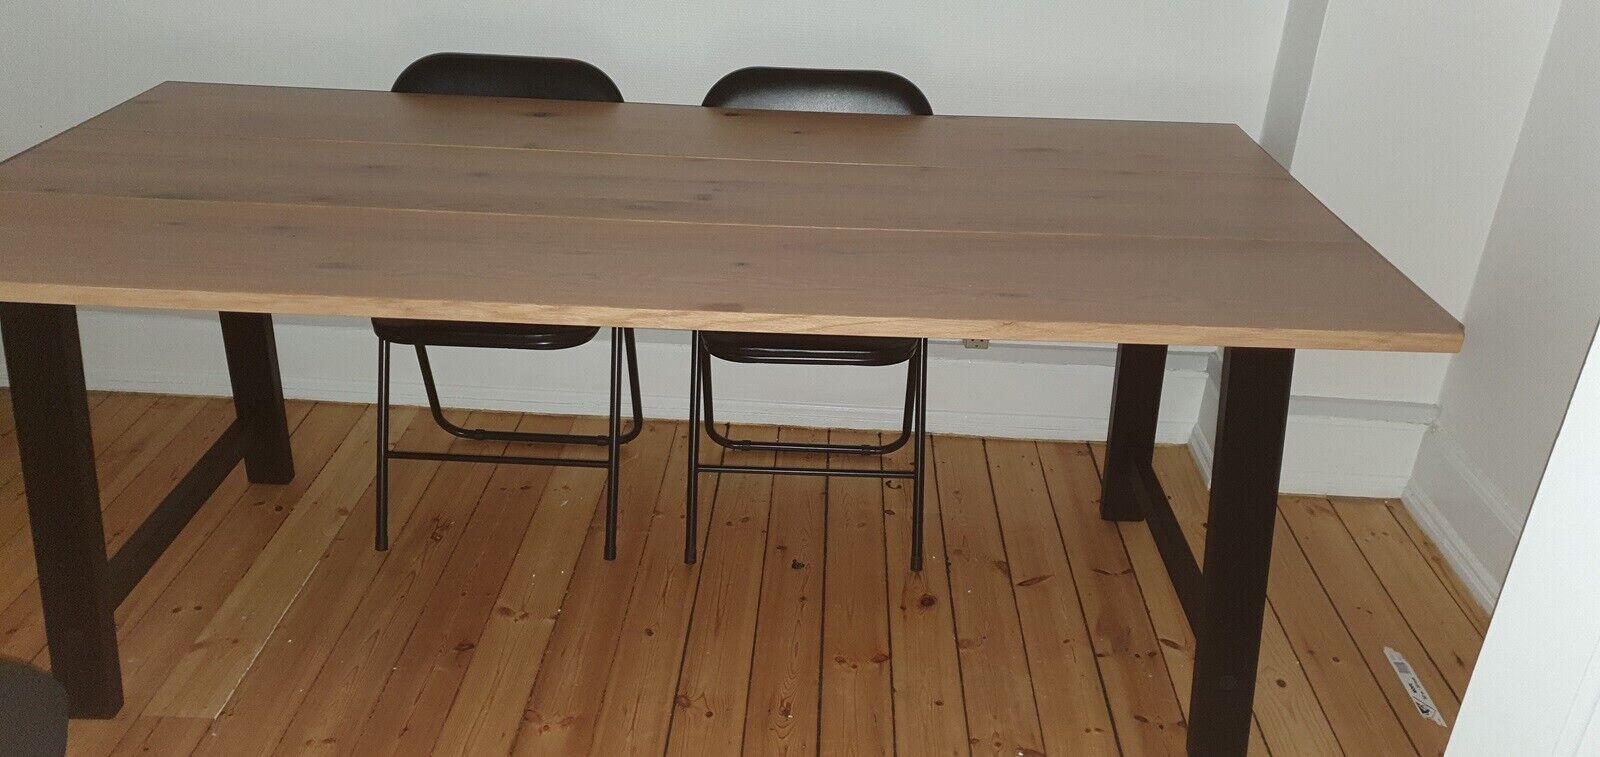 Spisebordsstol, EG, Gadeskov